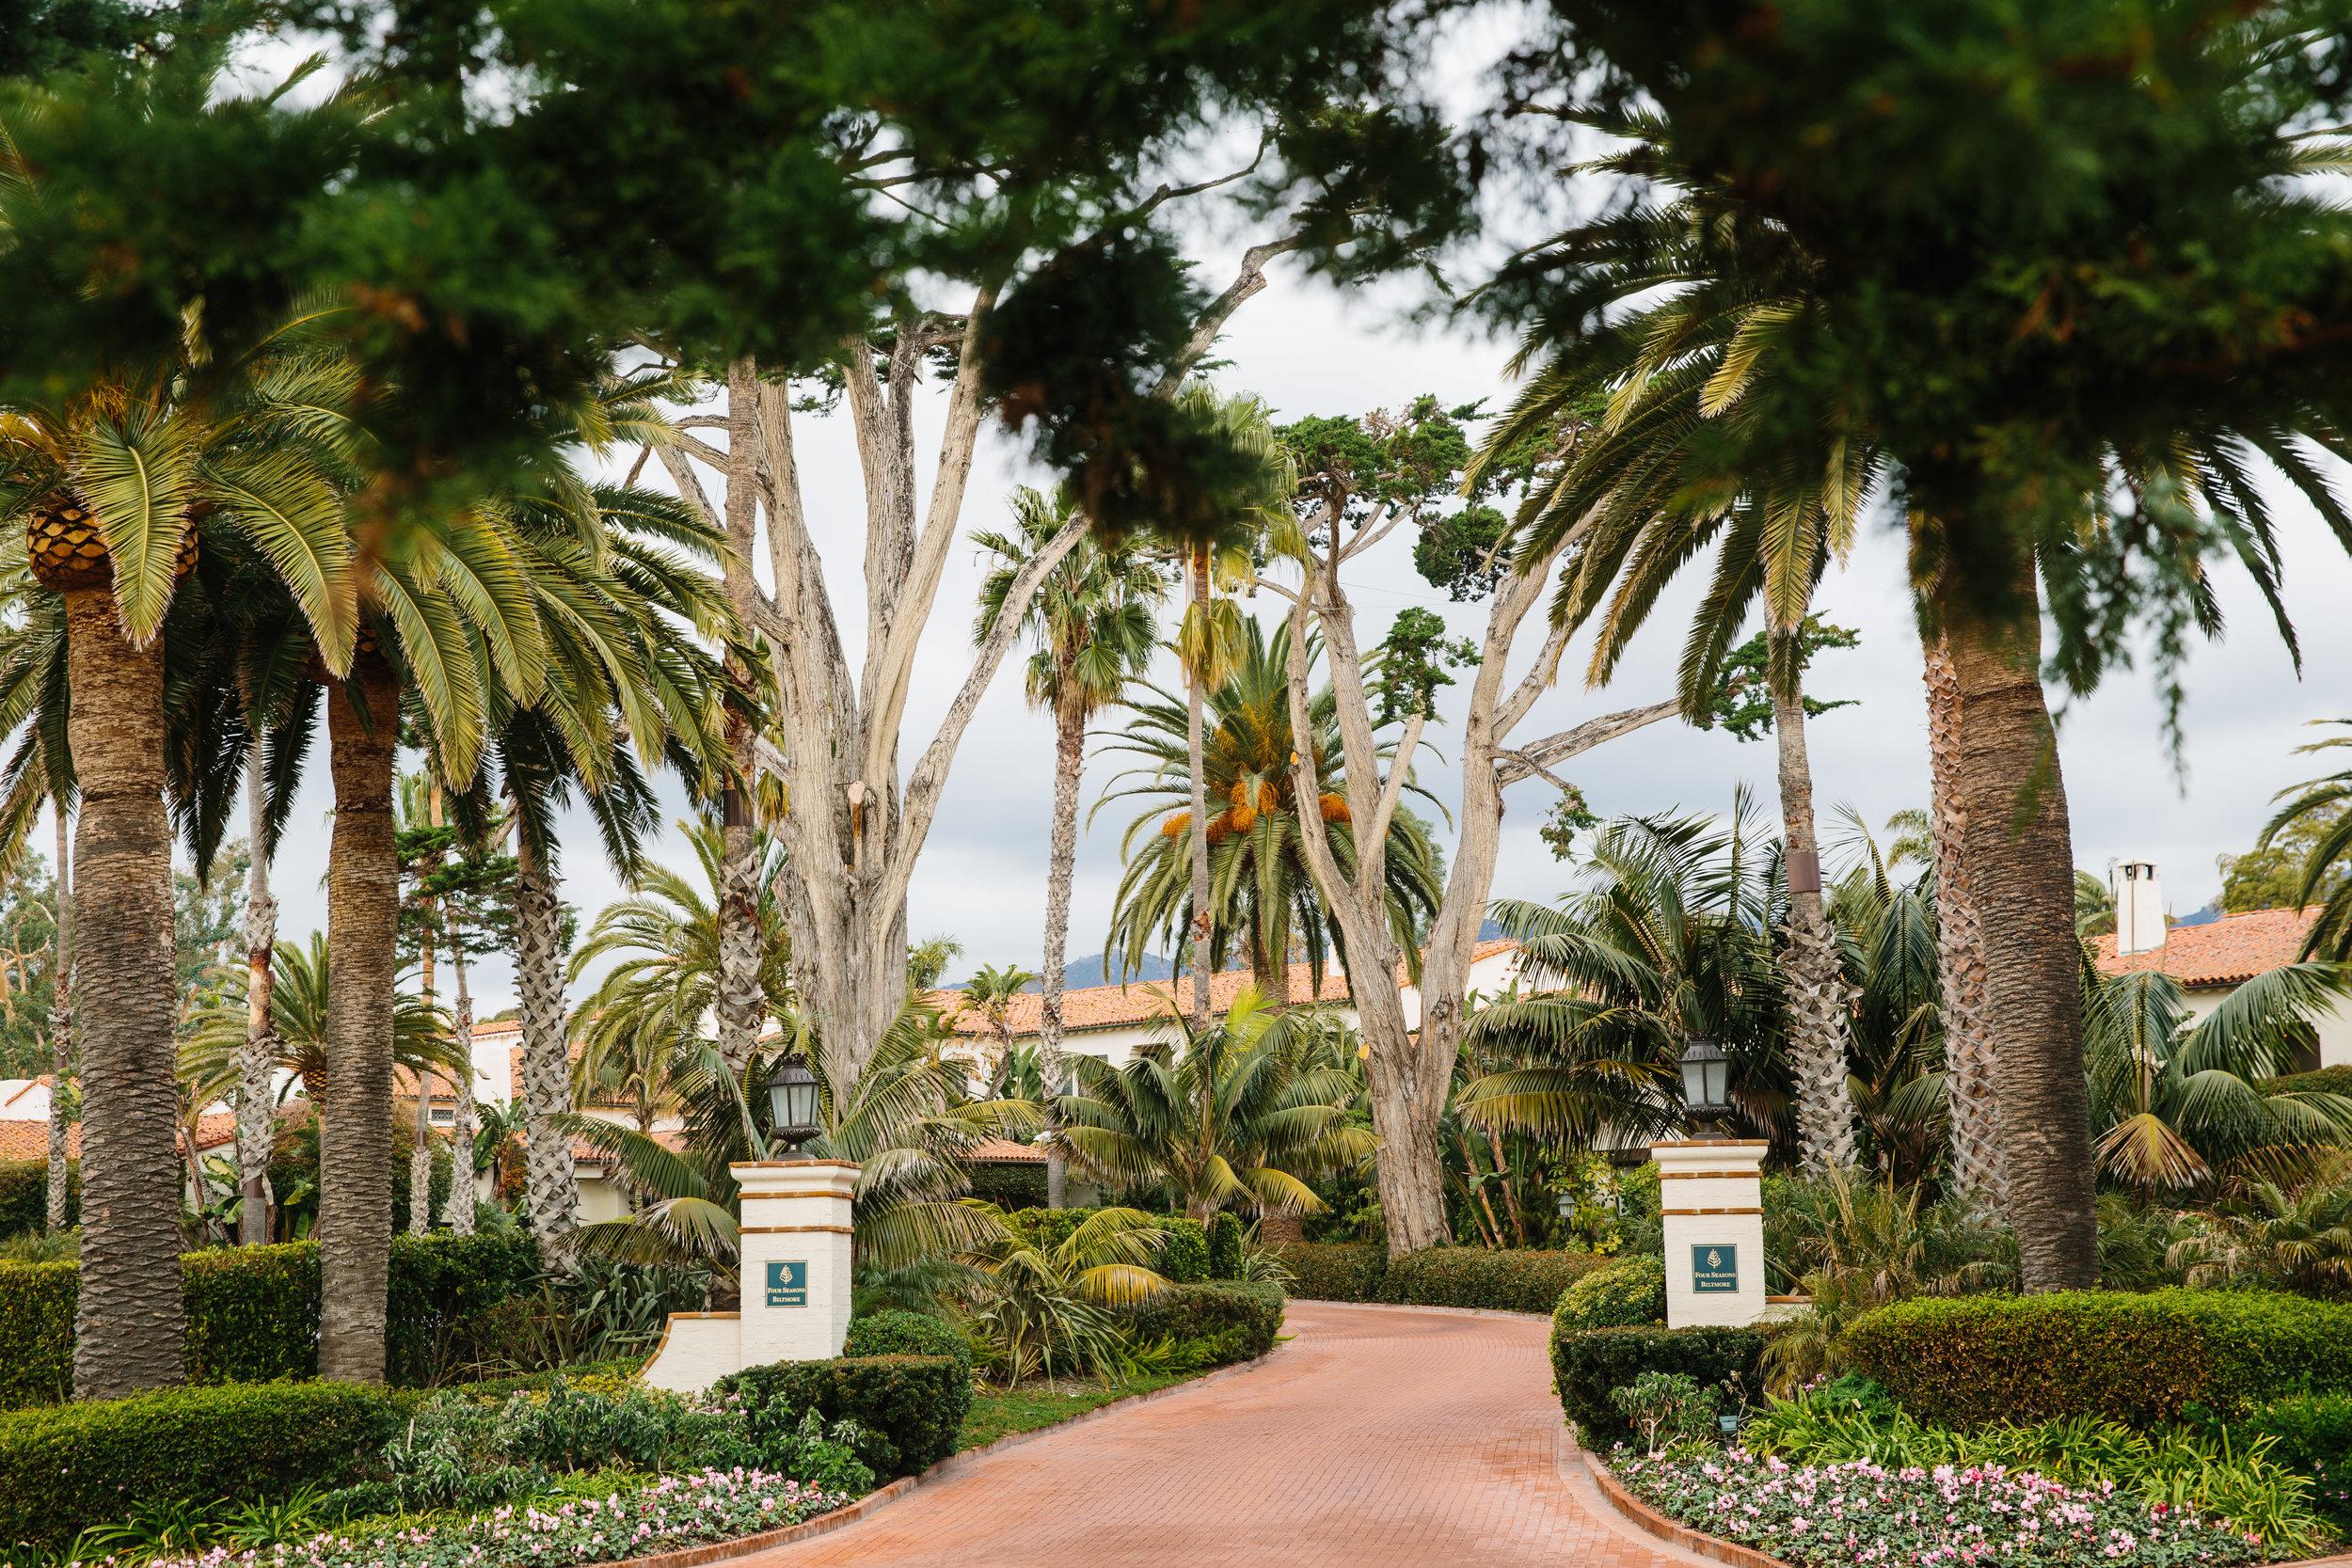 Four Seasons Resort The Biltmore, Montecito California | Image by - Compass